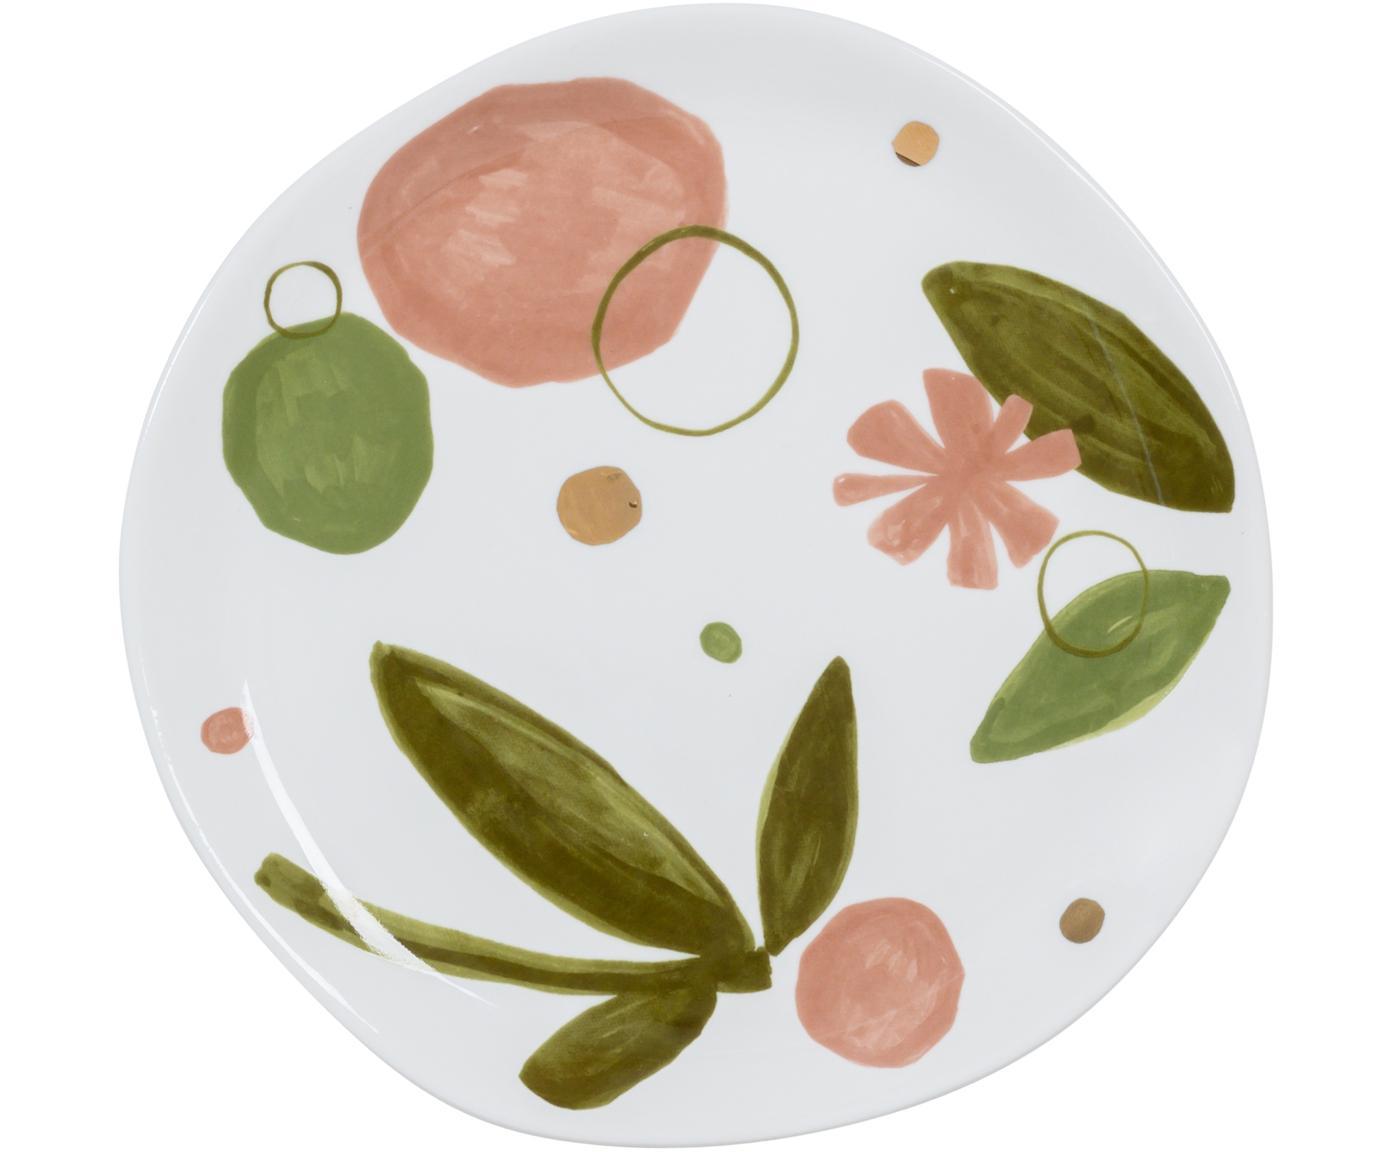 Bemalter Frühstücksteller Expressive, New Bone China, Weiß, Rosa, Grün, Goldfarben, Ø 17 cm